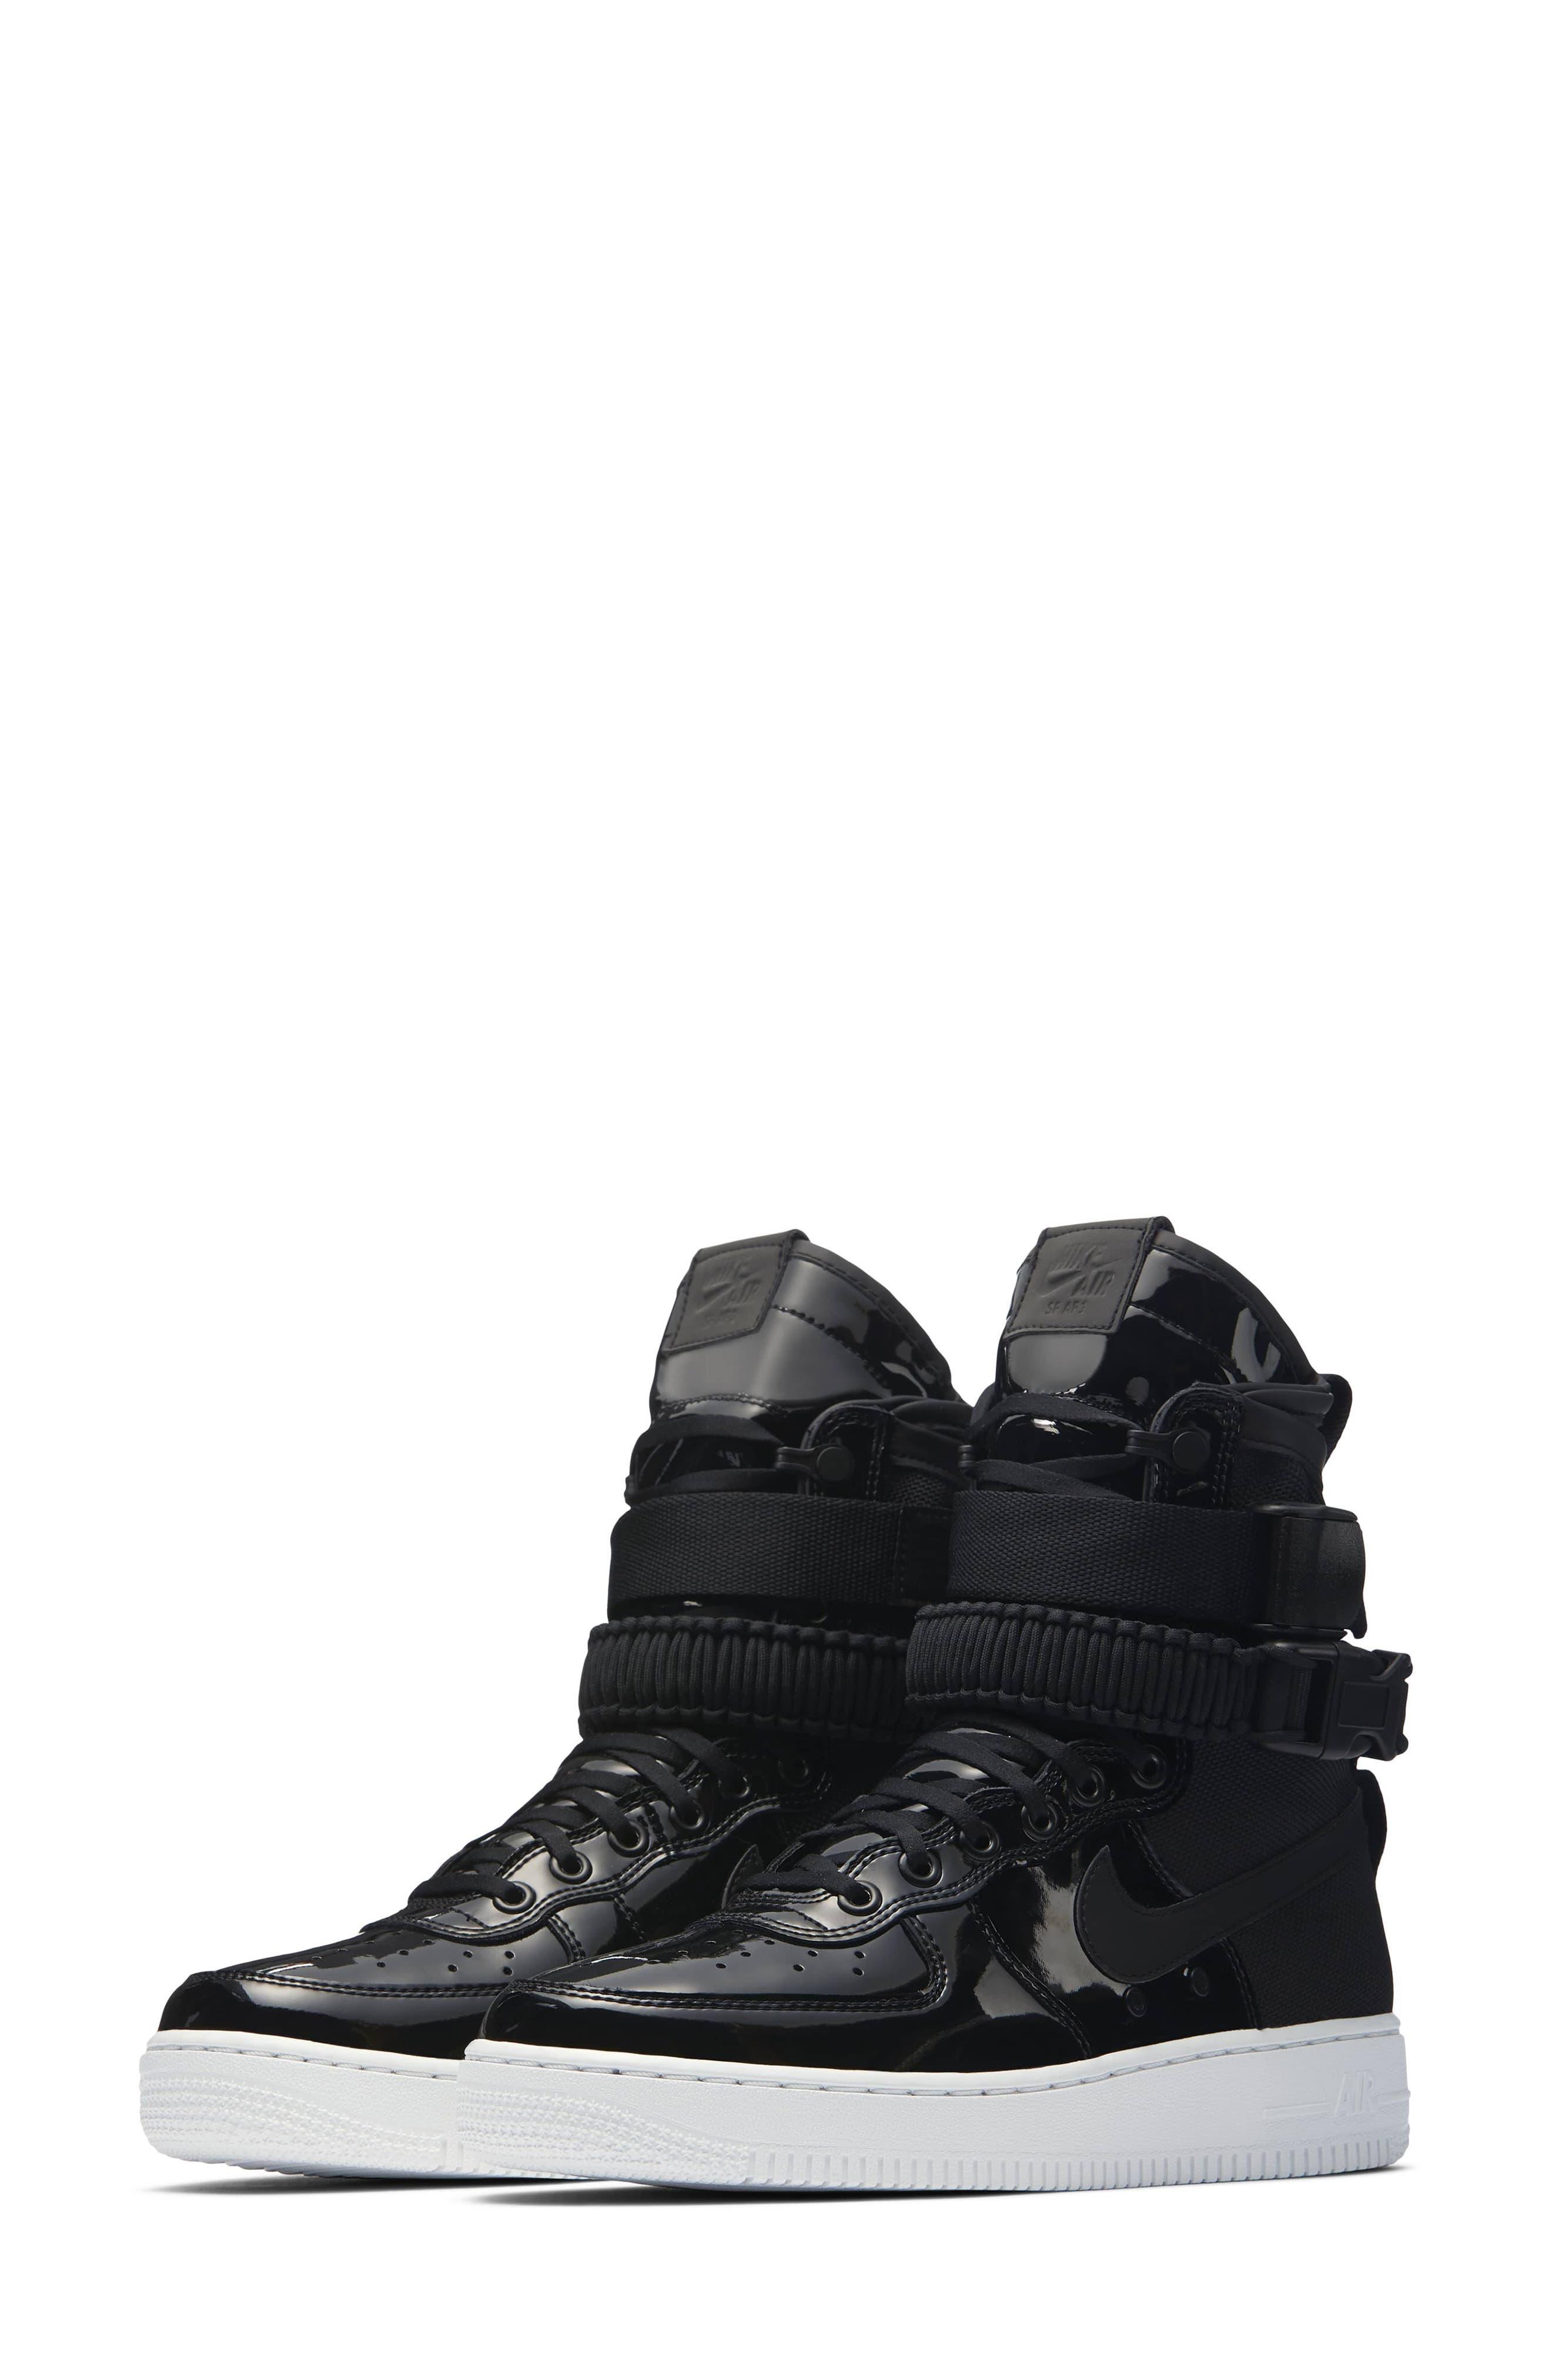 Nike SF Air Force 1 High Top Sneaker (Women)